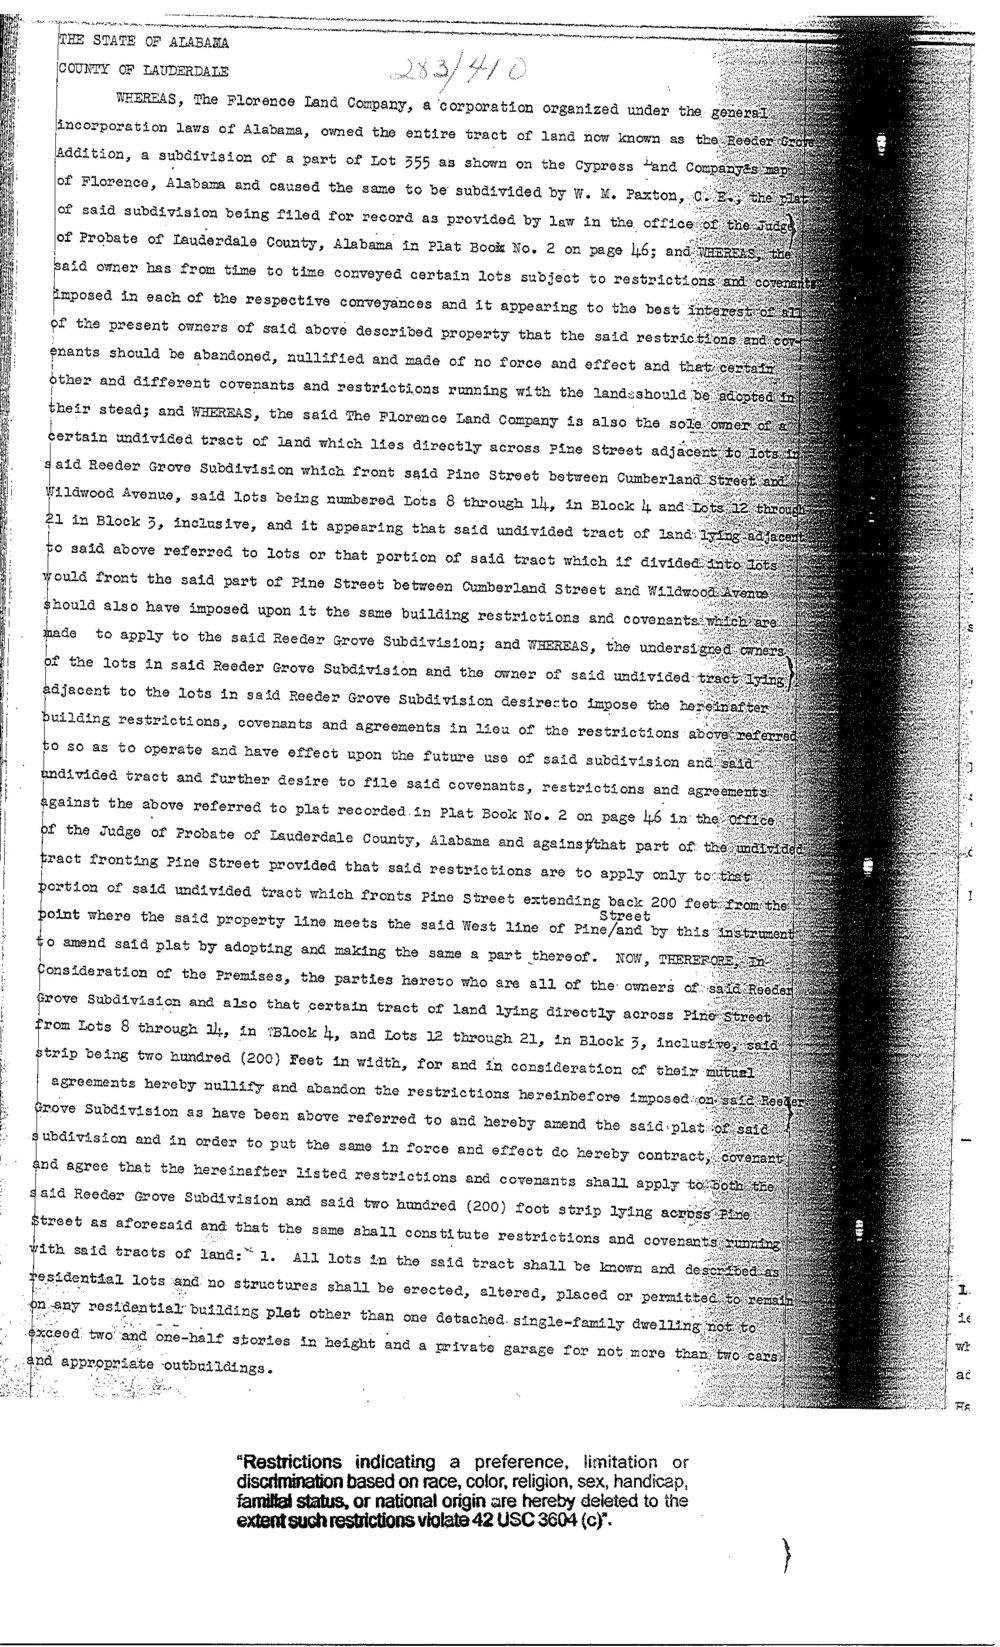 Covenants-Reeder-Grove-No-2-1.jpg